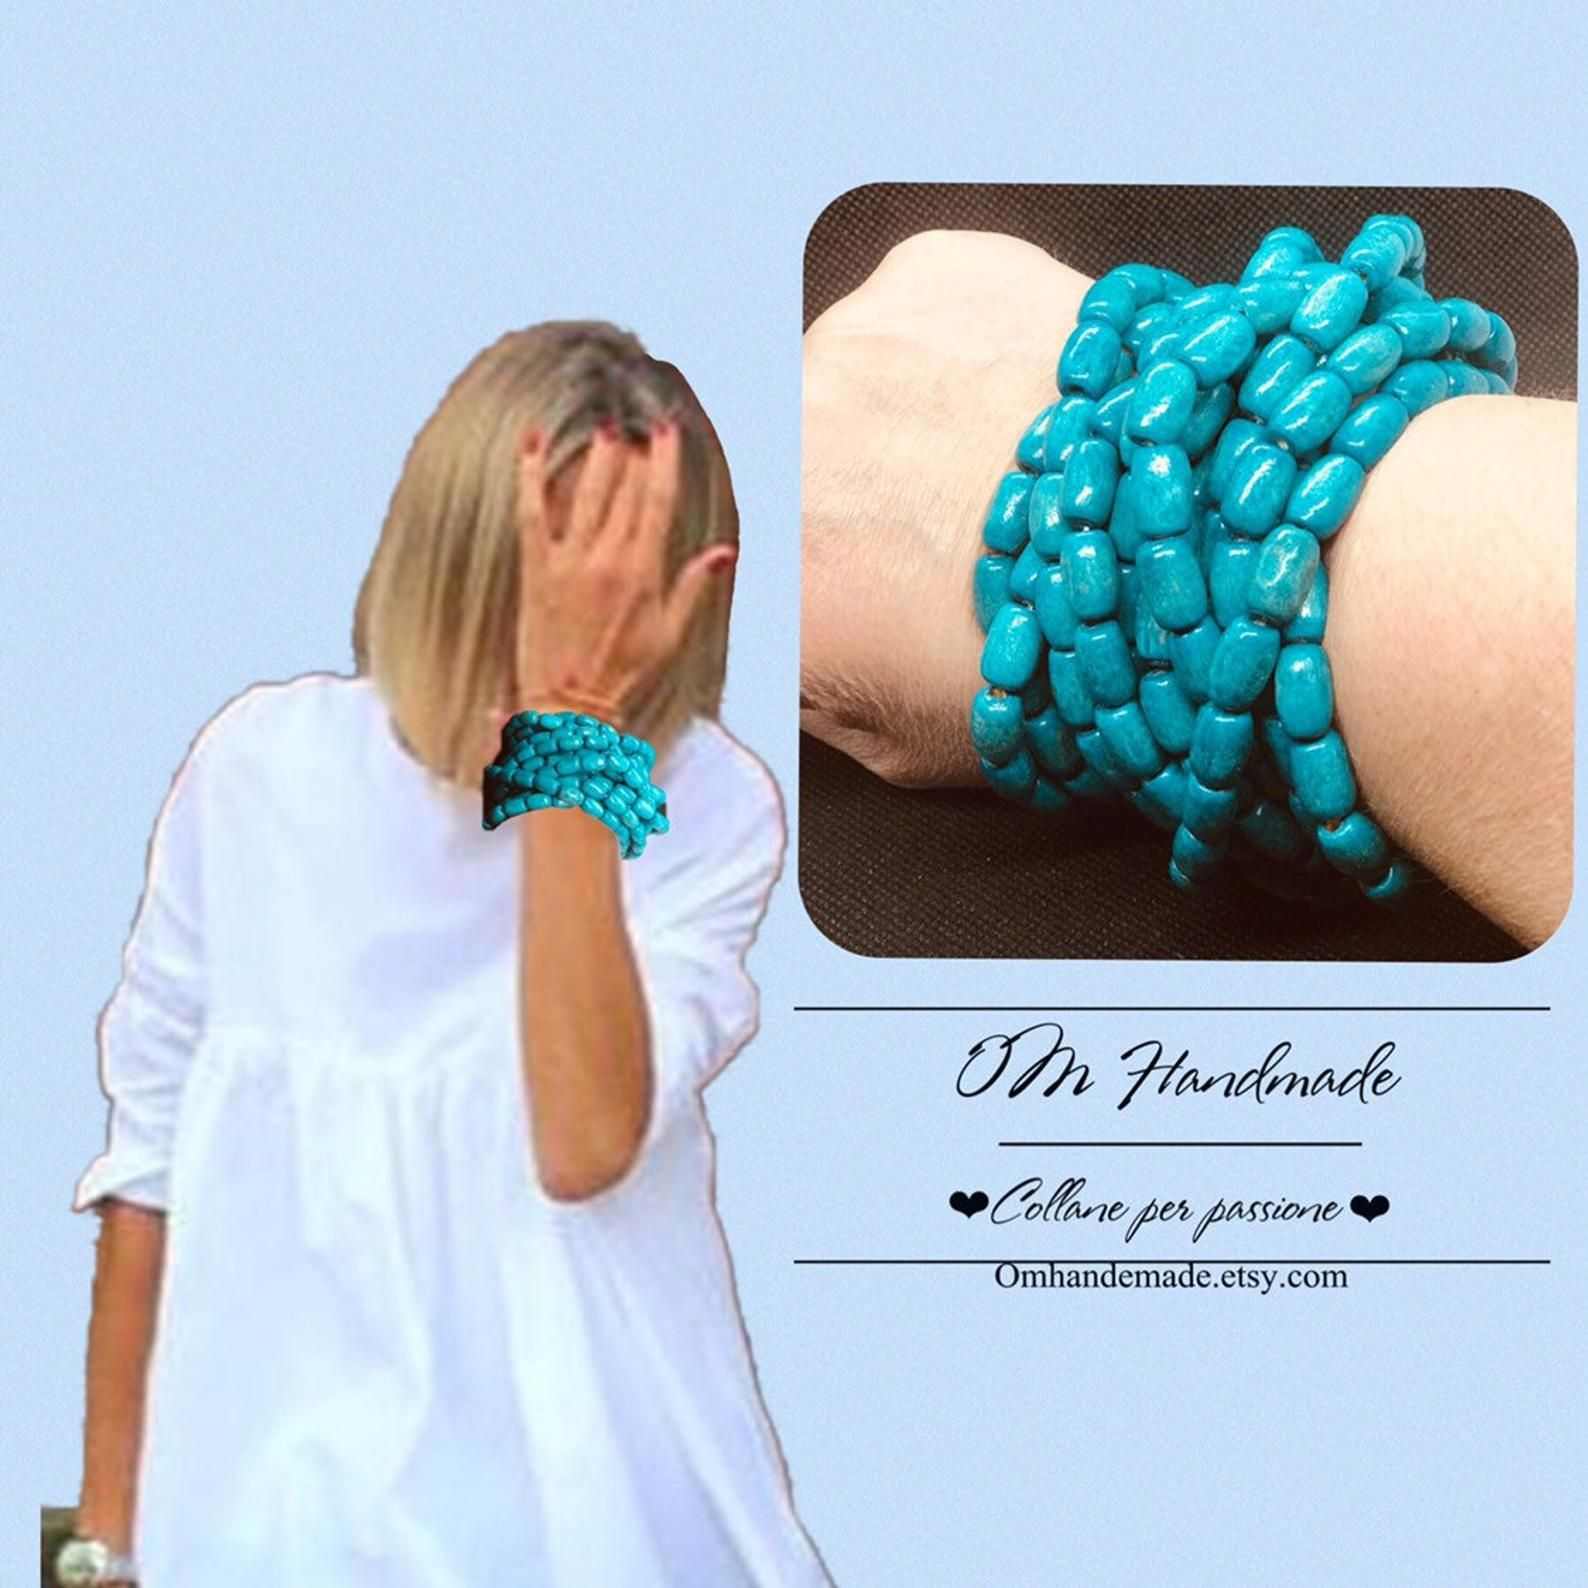 codice promozionale c0ef0 64bb2 Bracelet, turquoise wood bracelets, personalizabile multi ...